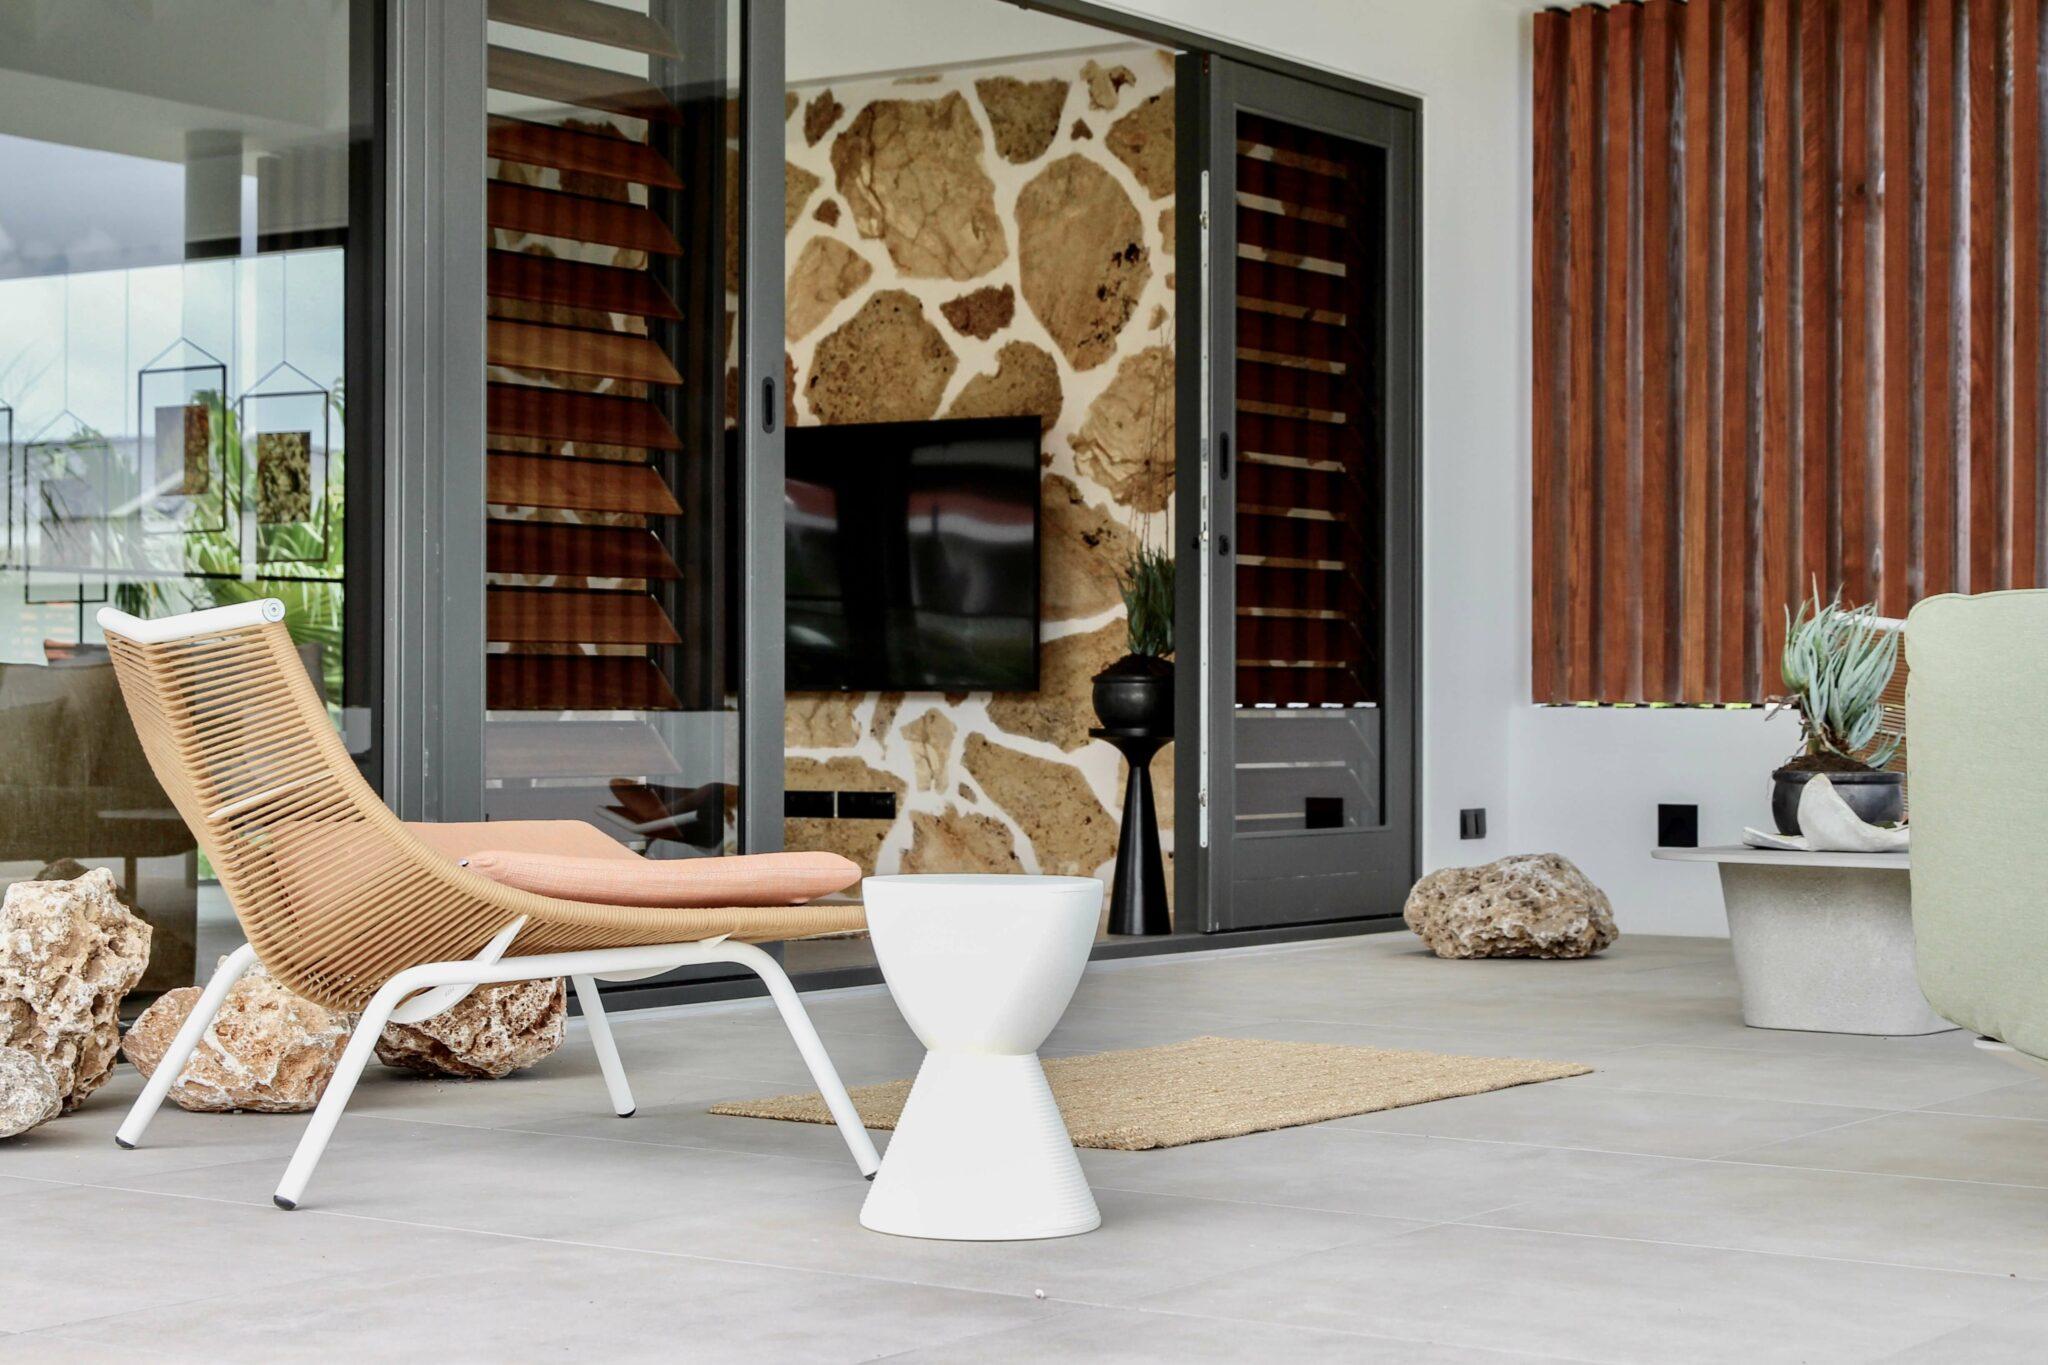 sea-roots-villas-villa-elise-lounge